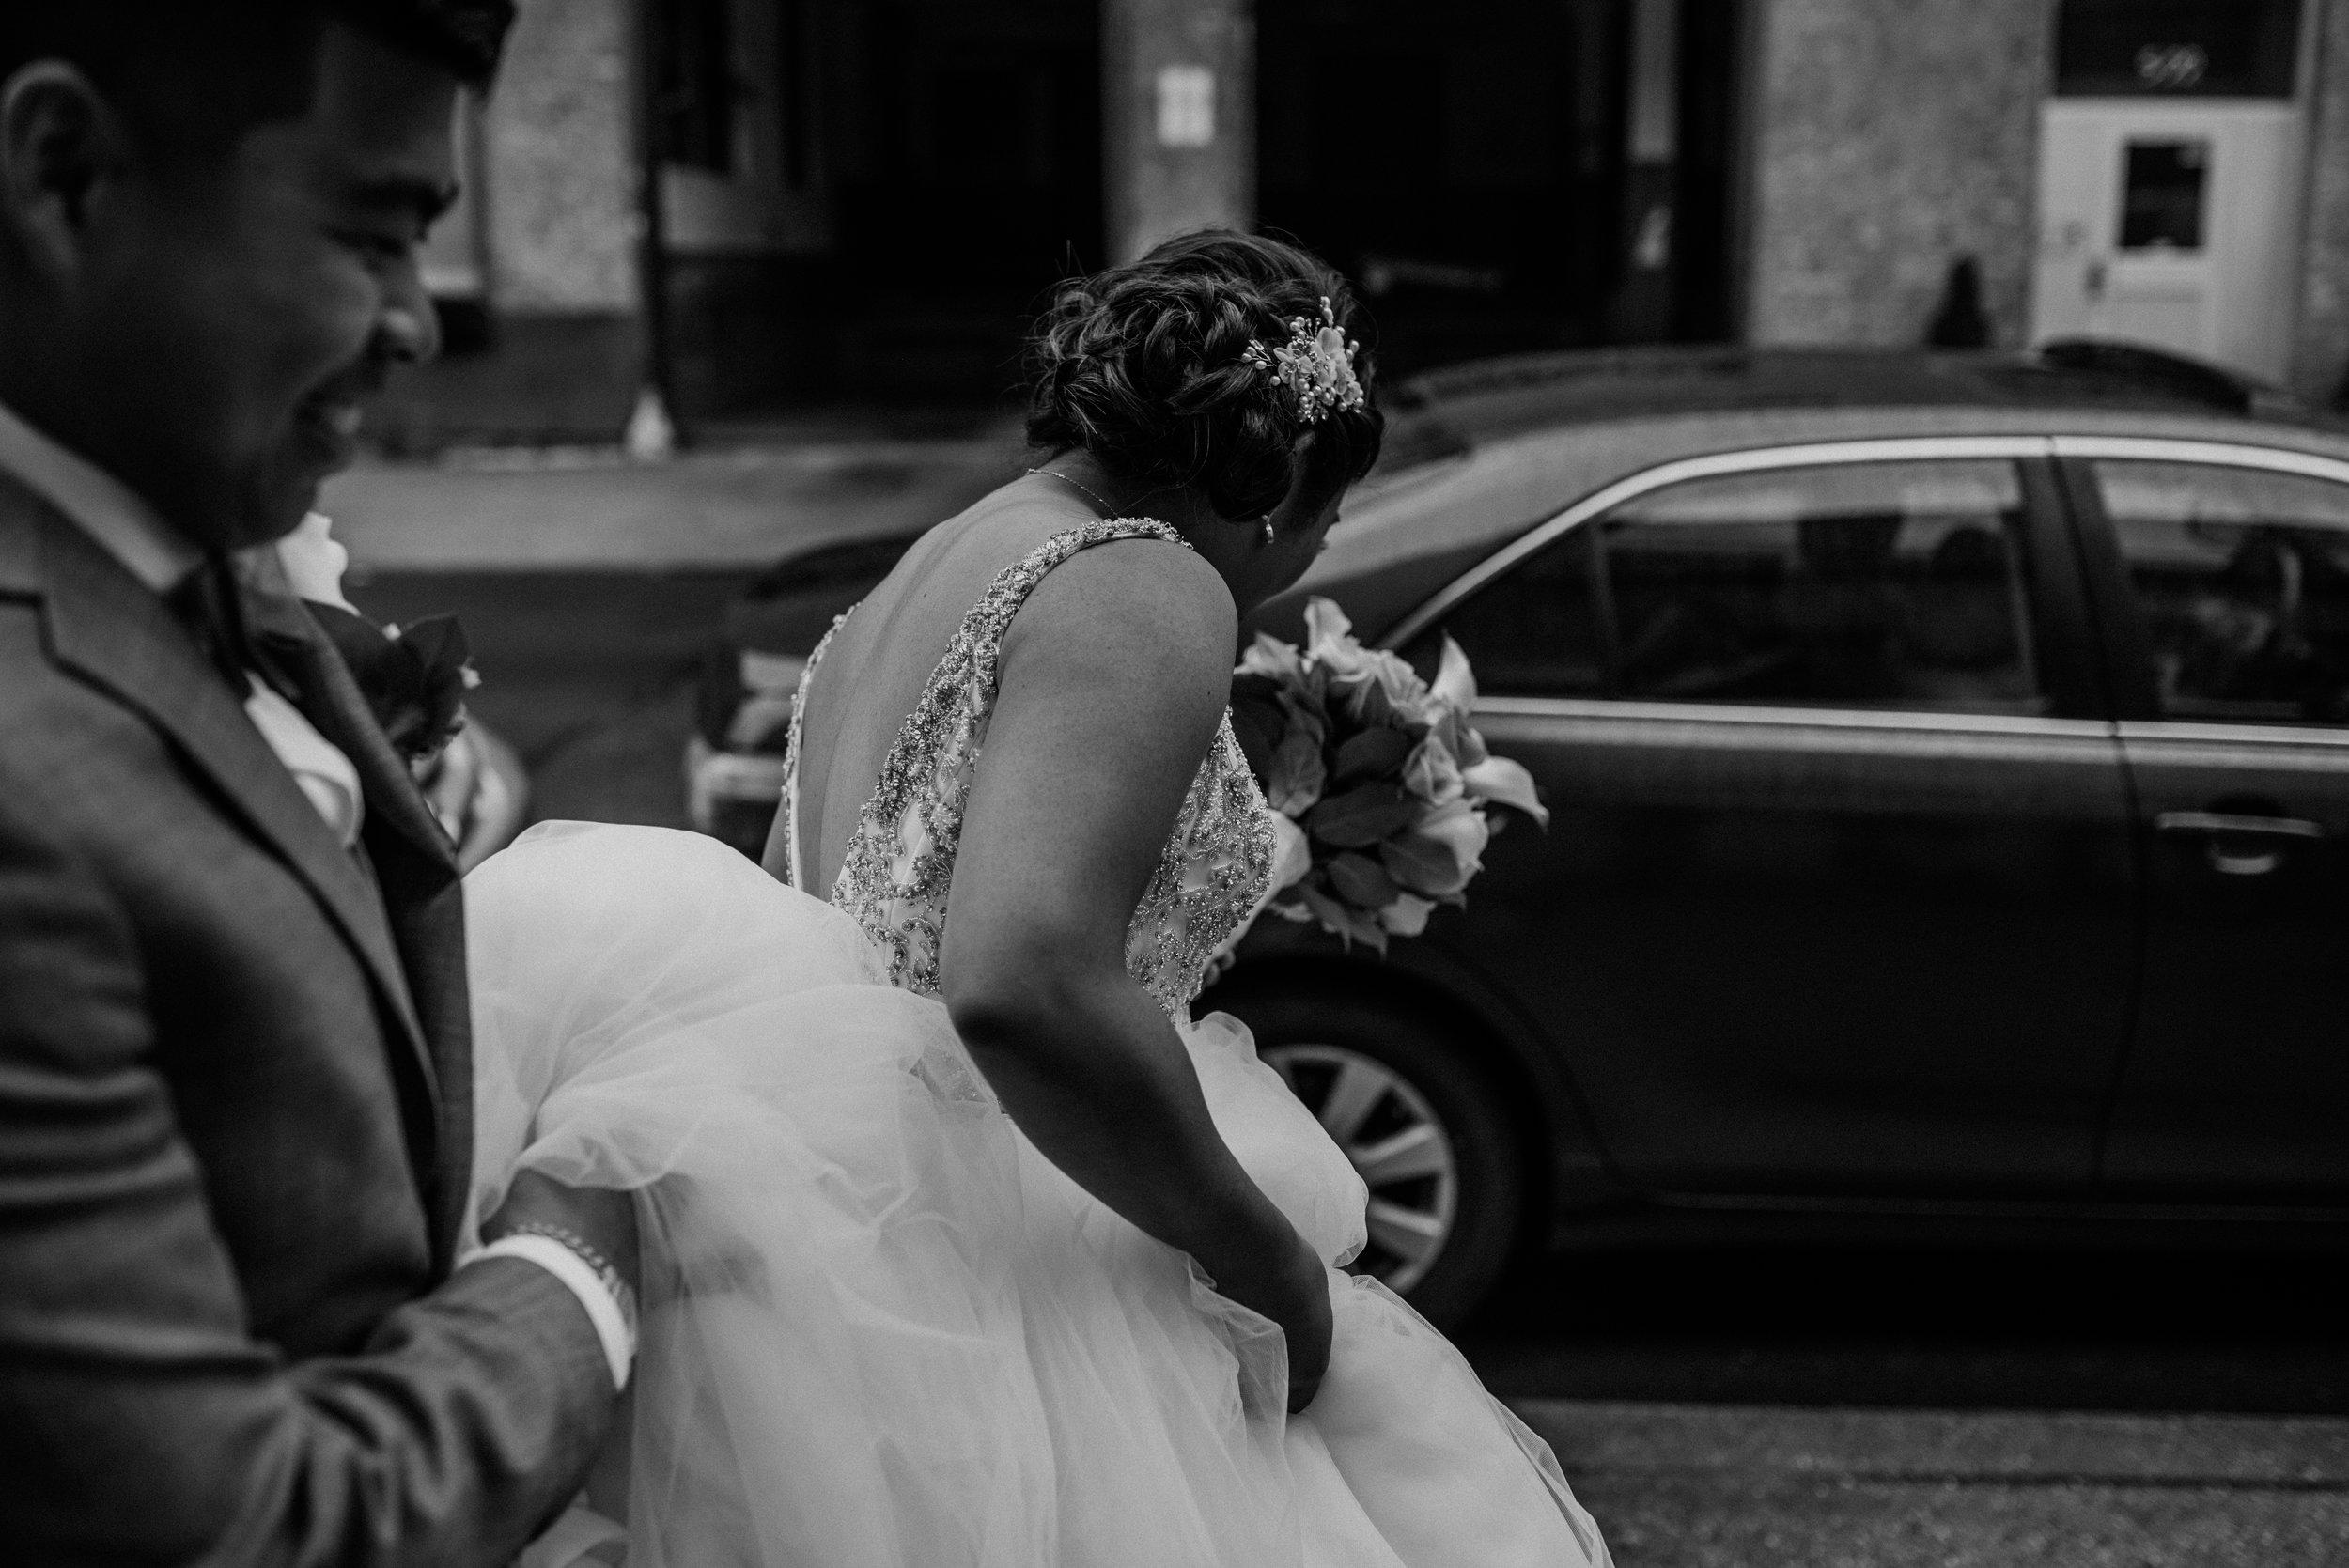 Main and Simple Photography_2017_Weddings_NewYork_TinaJon-391.jpg